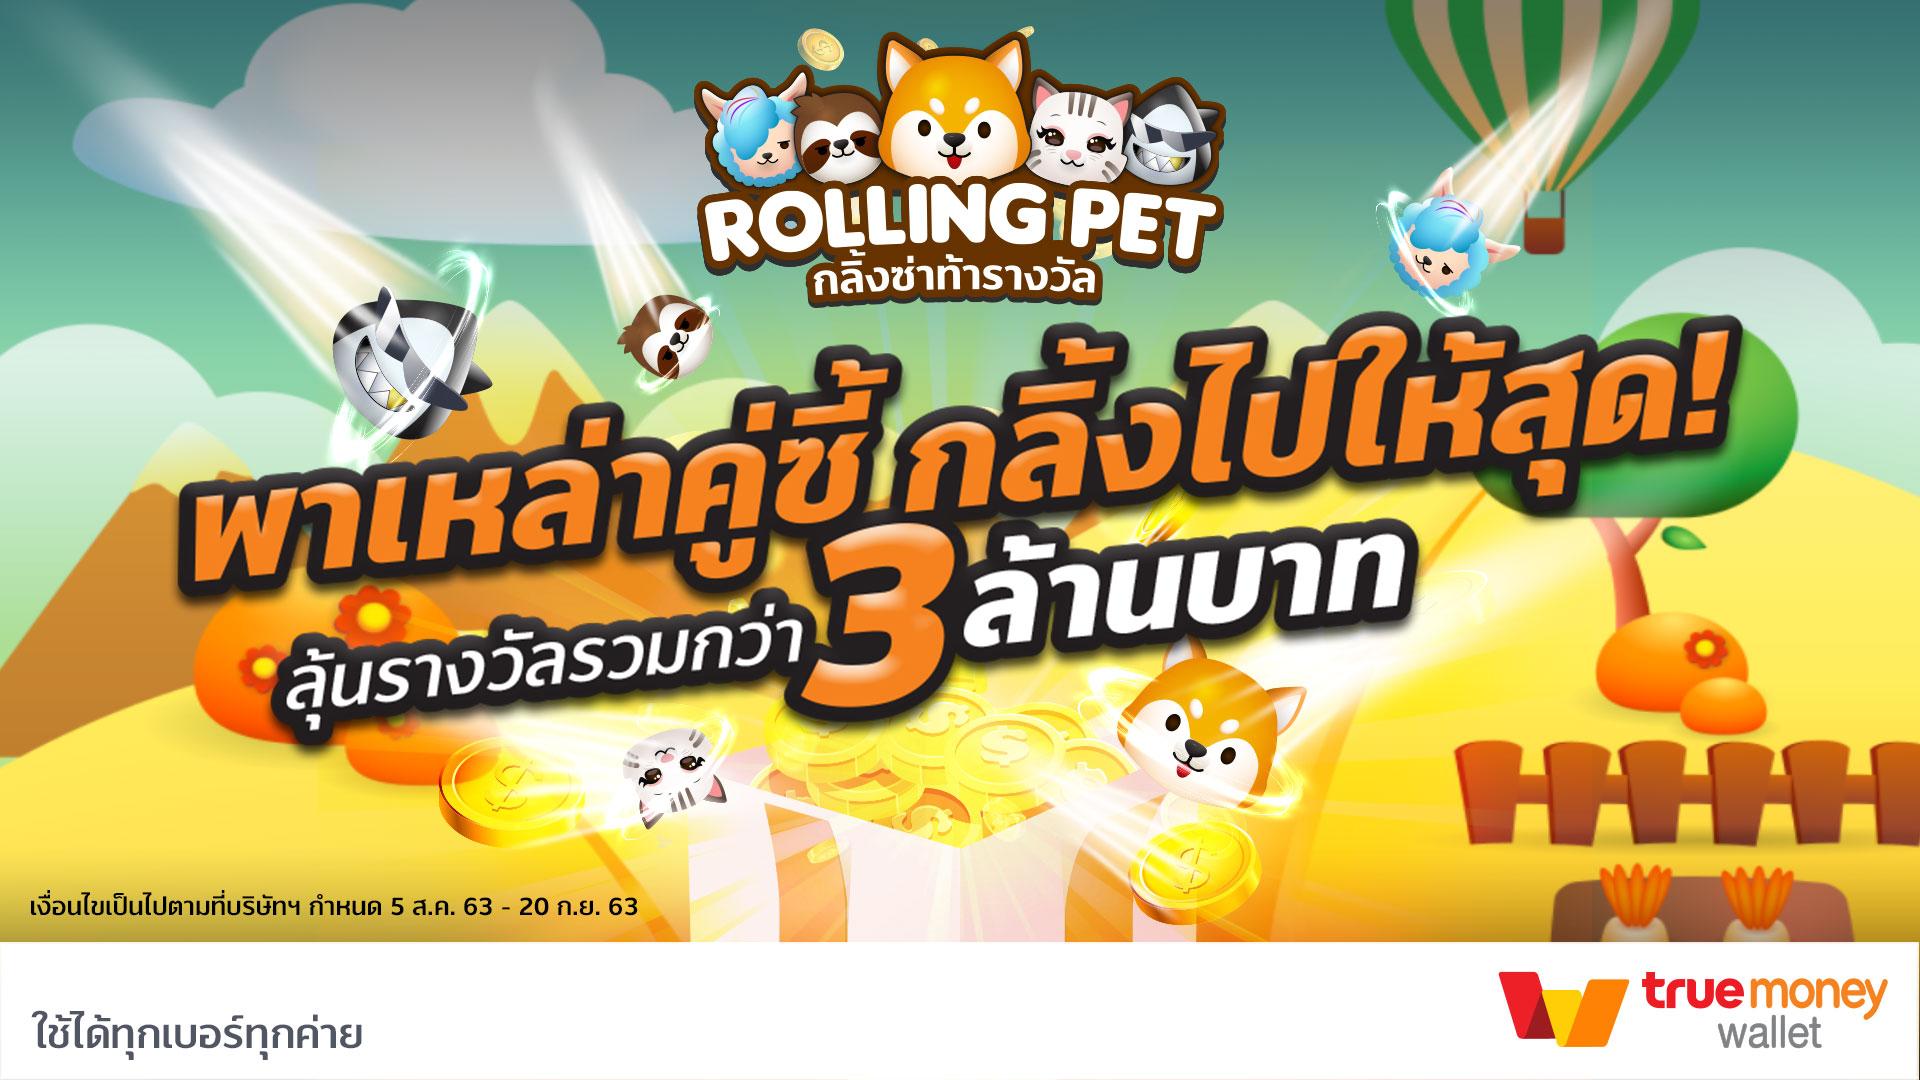 Rolling Pet กลิ้งซ่าท้ารางวัล รวมมูลค่ากว่า 3 ล้านบาท เมื่อเชื่อมต่อ และจ่ายตรงบน Google Play ด้วย TrueMoney Wallet